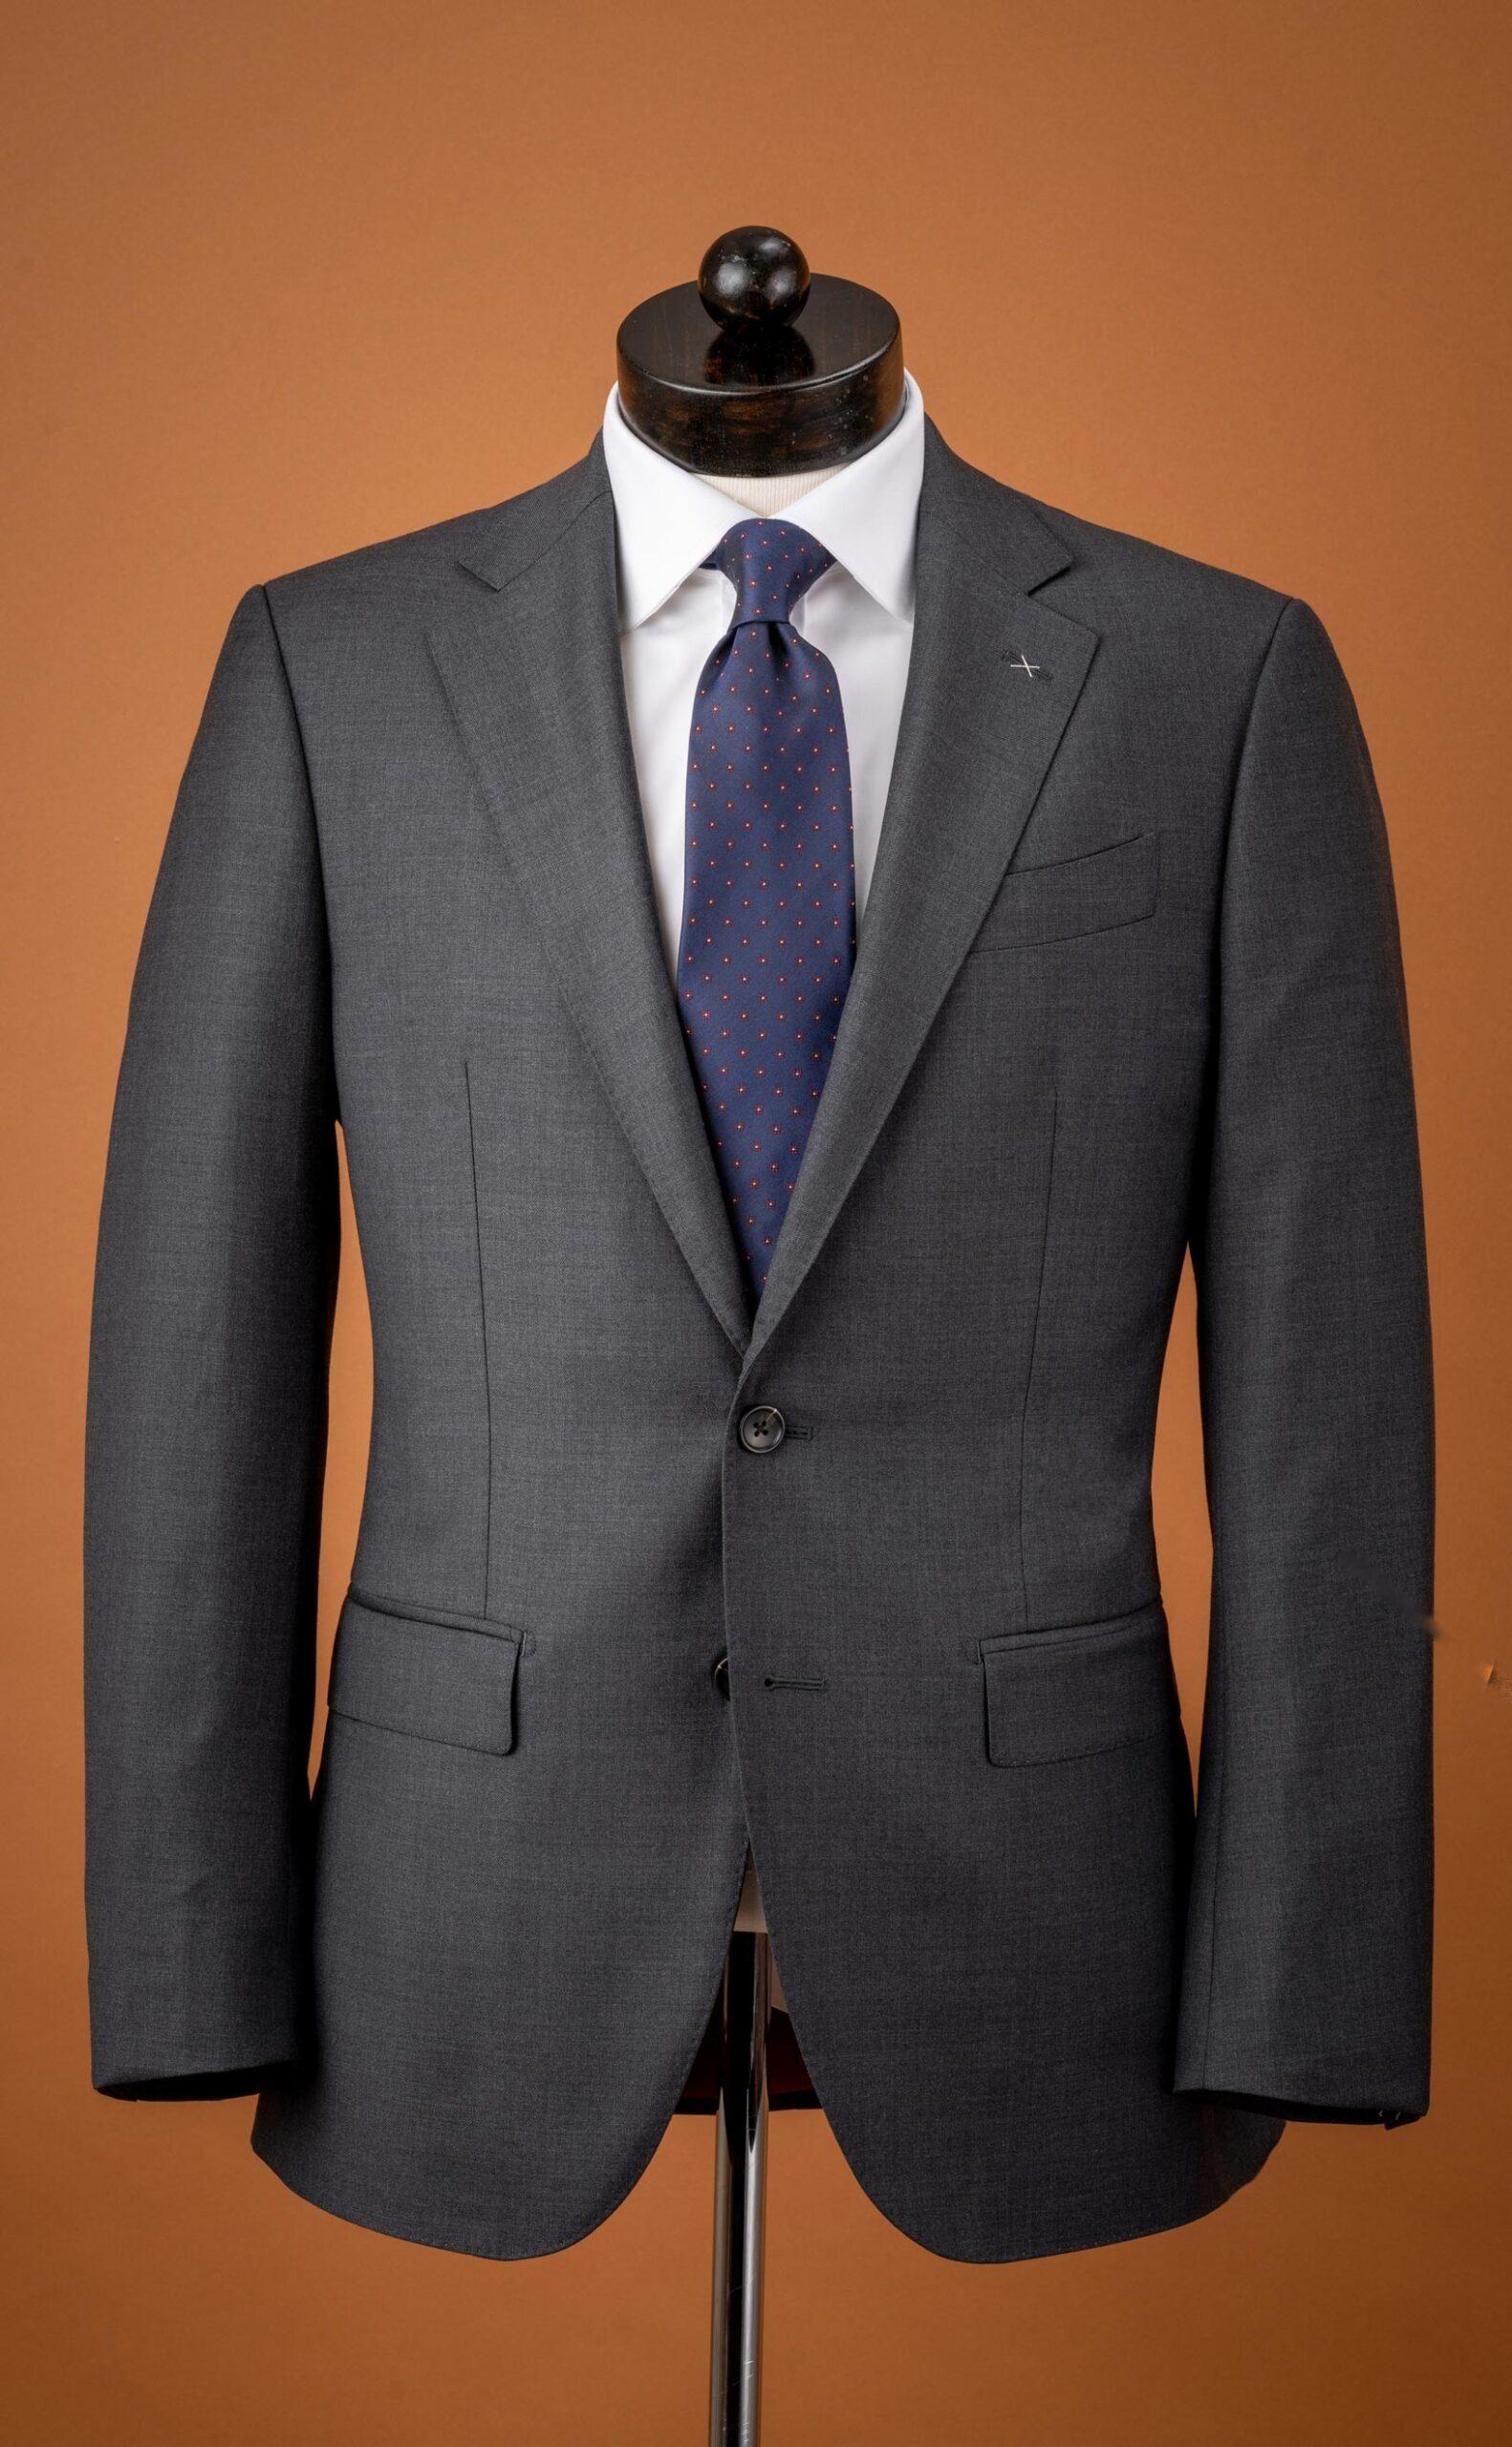 Spier & Mackay Medium Gray Suit